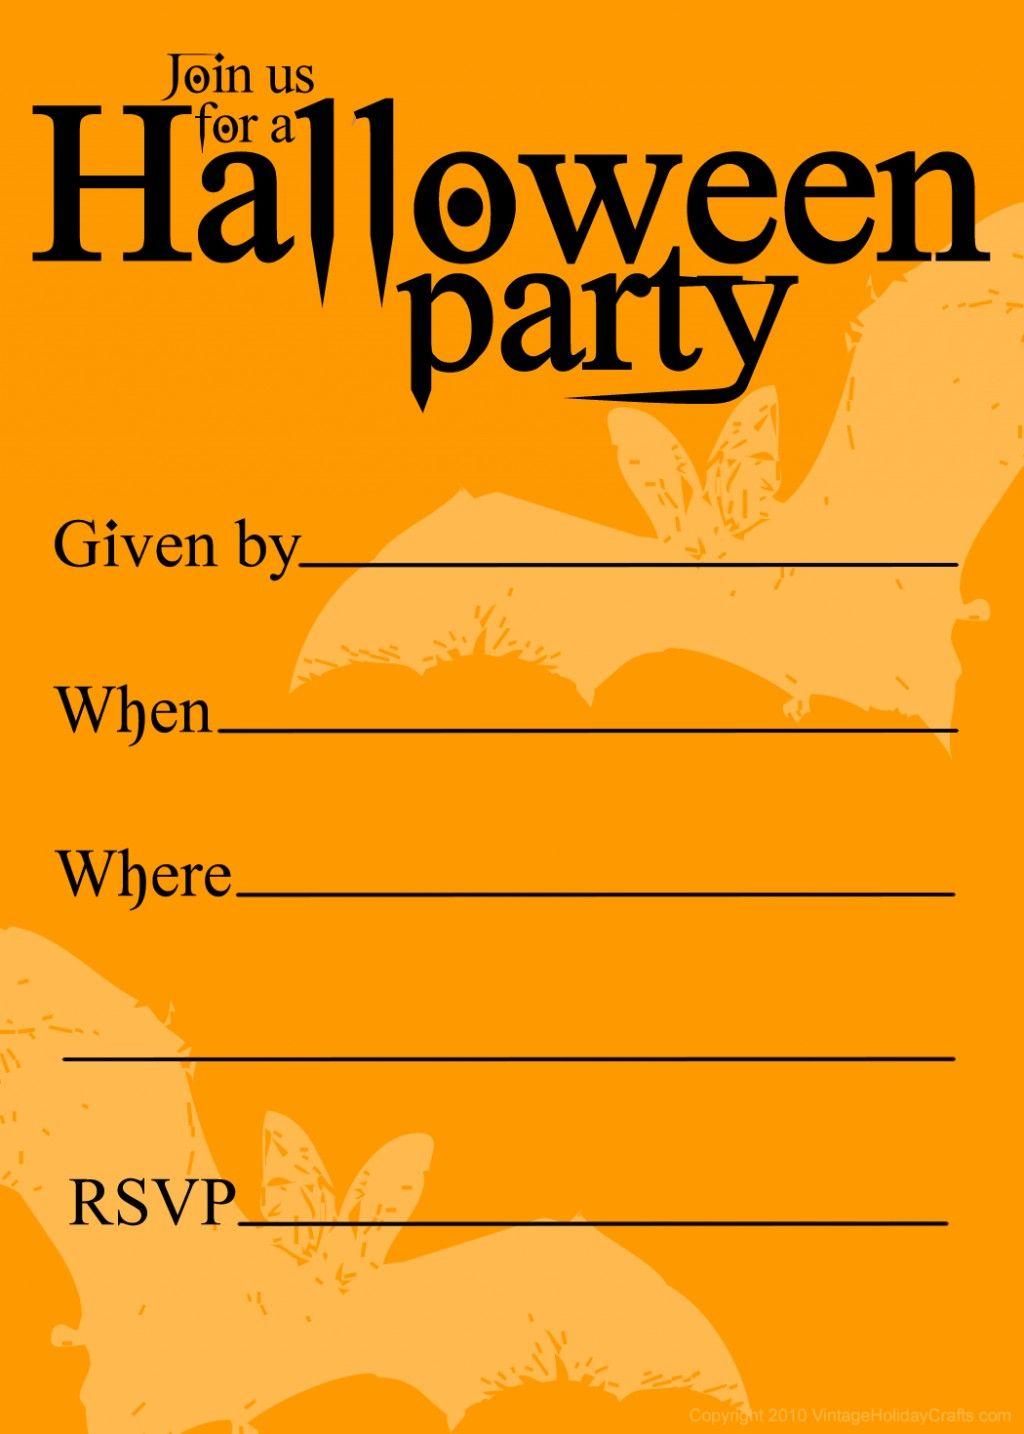 Free Printable Halloween Birthday Invitations Templates | Halloween - Free Printable Halloween Party Invitations